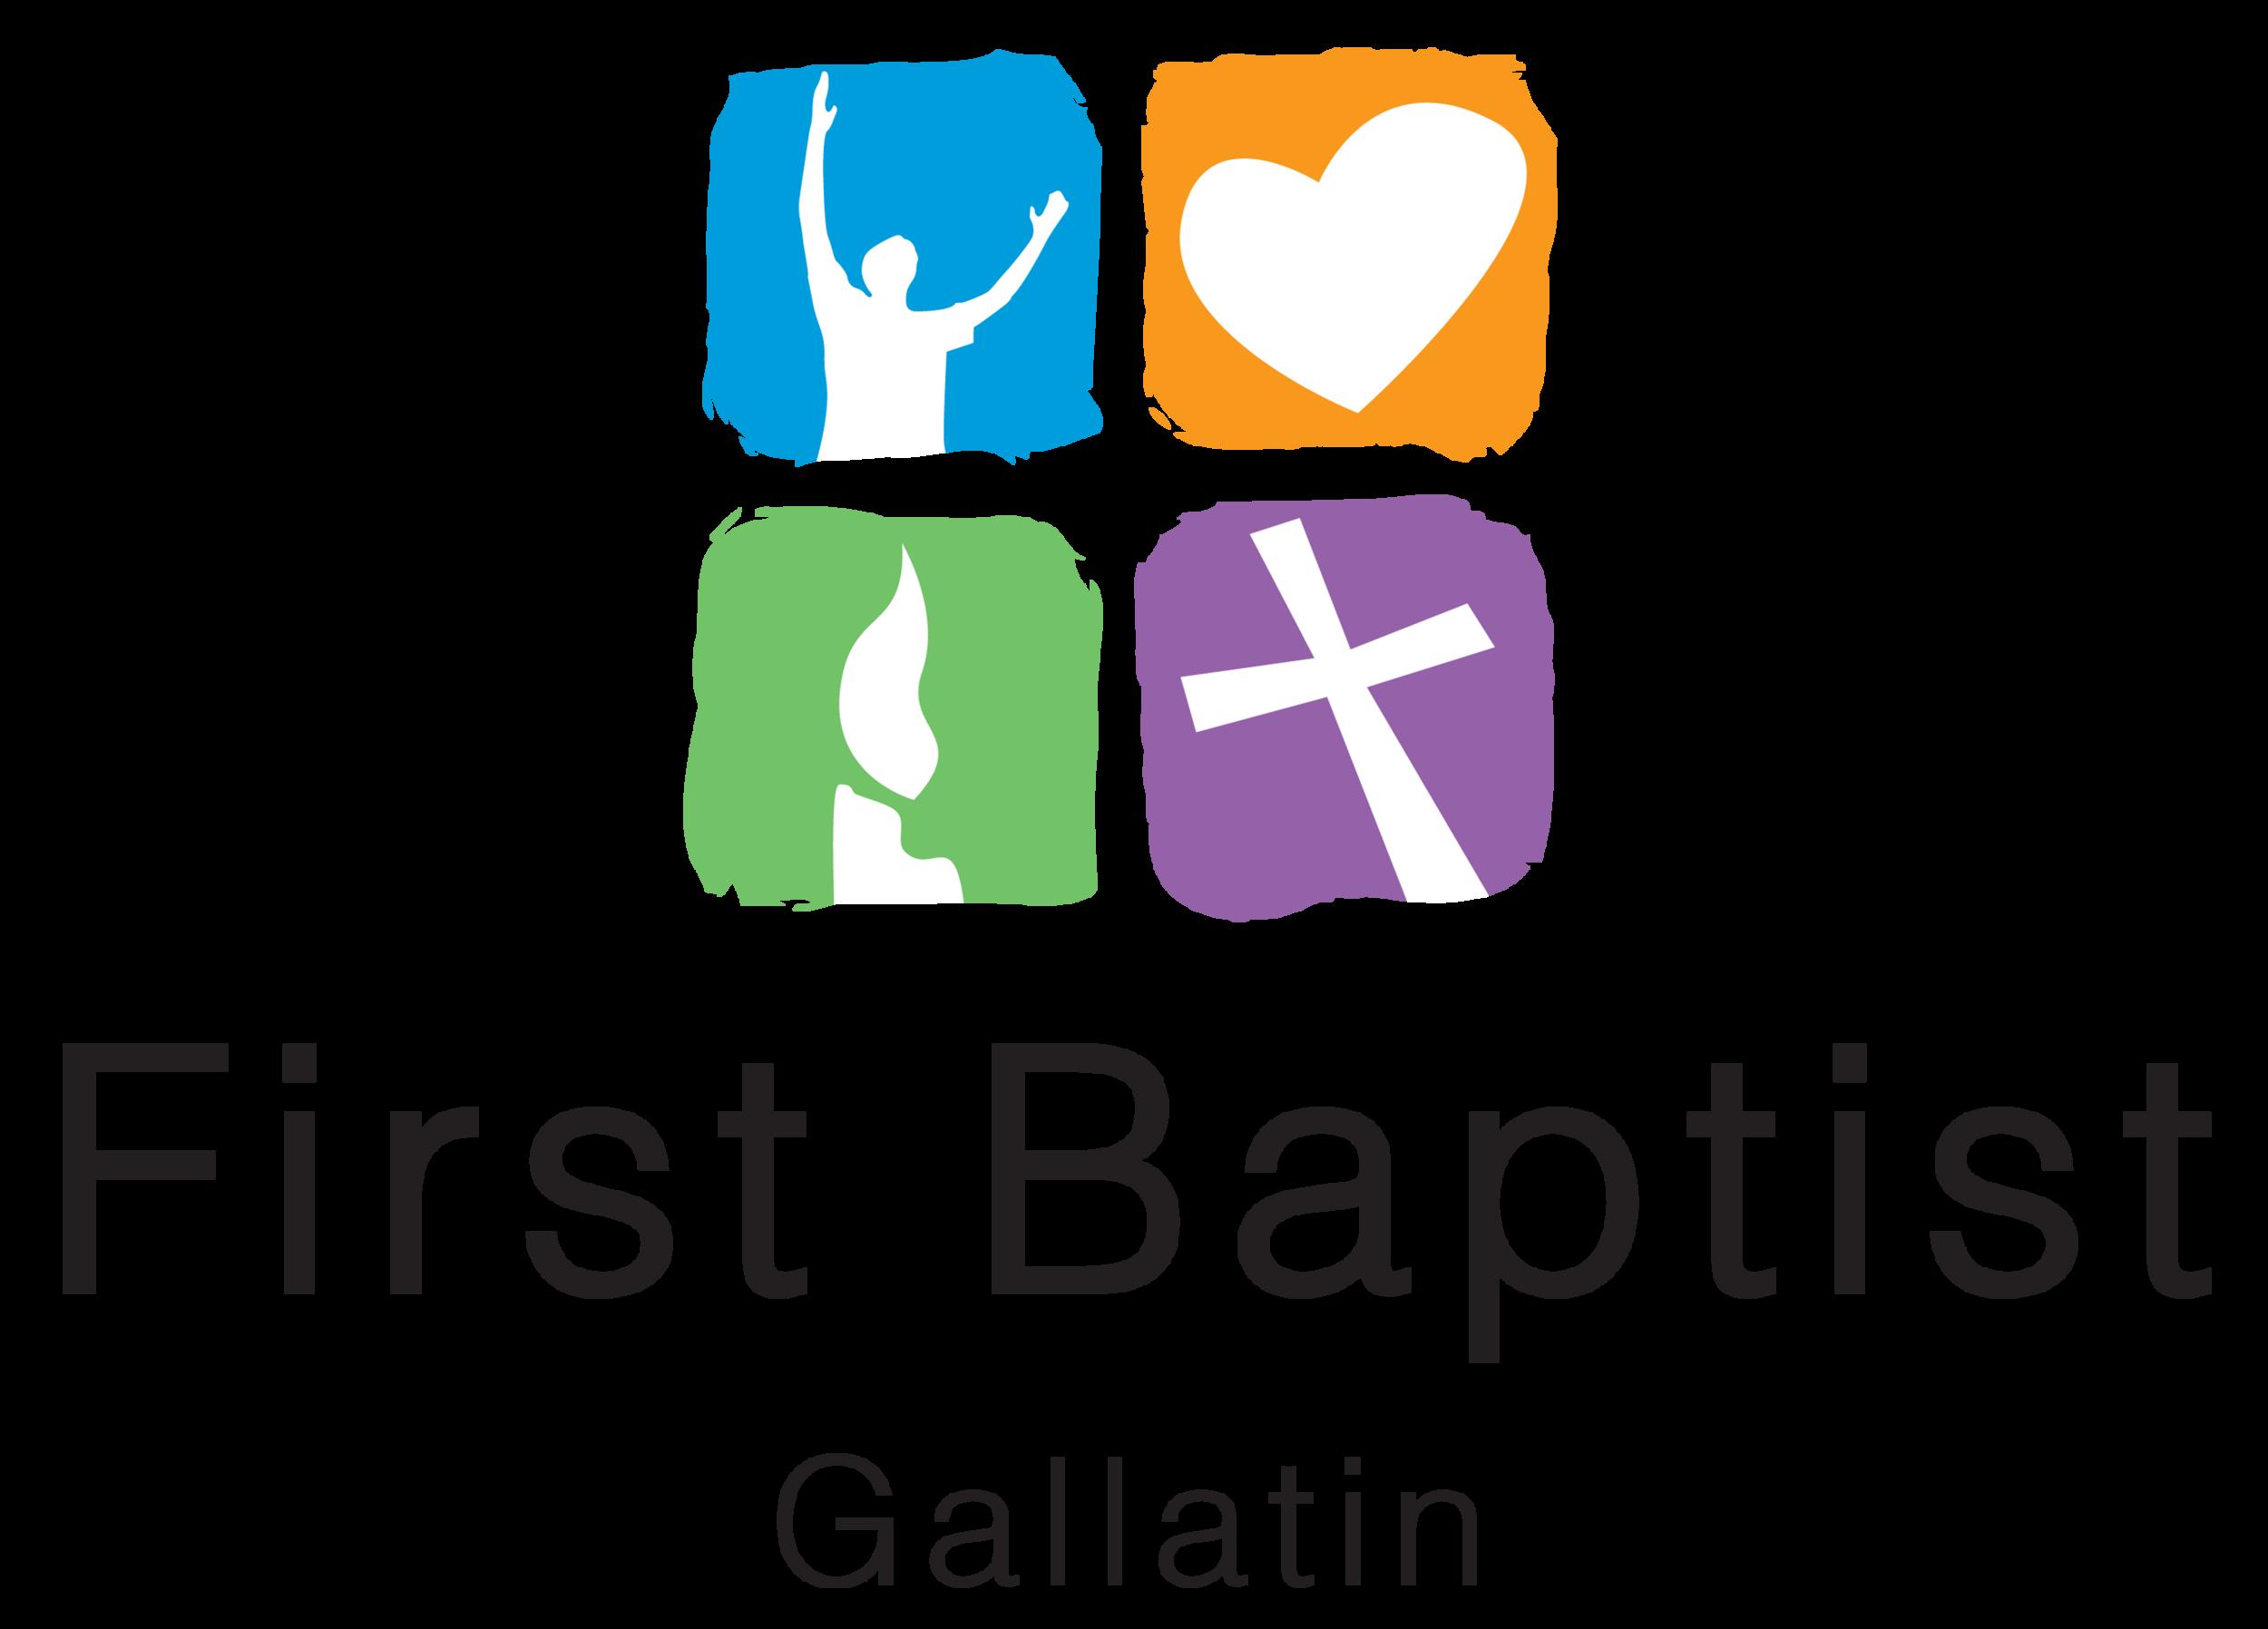 Logo FBCG_2012_black_text (3) (1).png